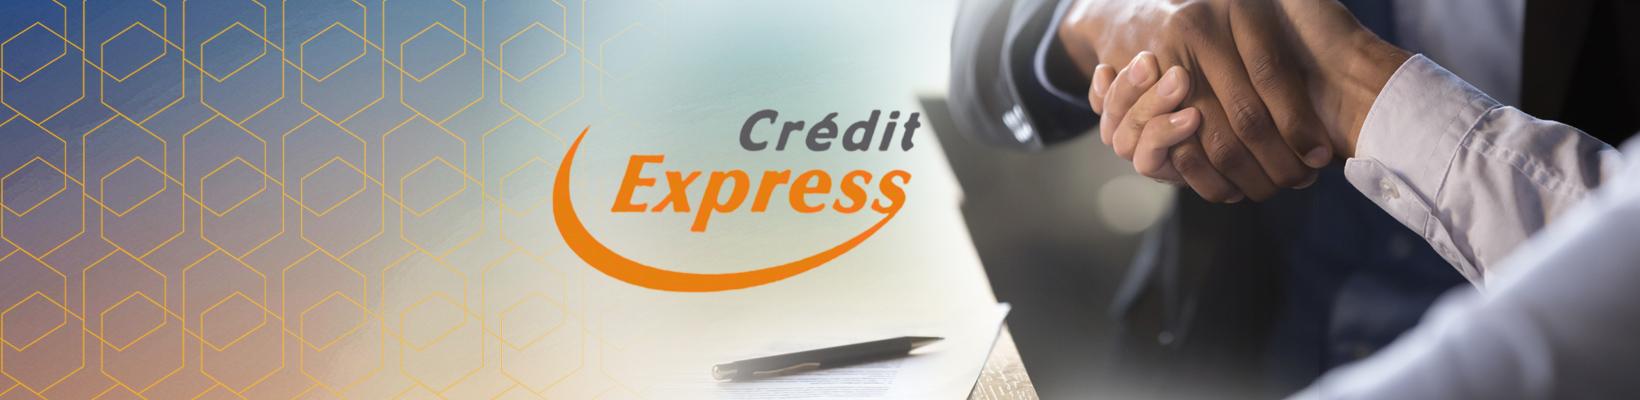 1640x400-credit-express